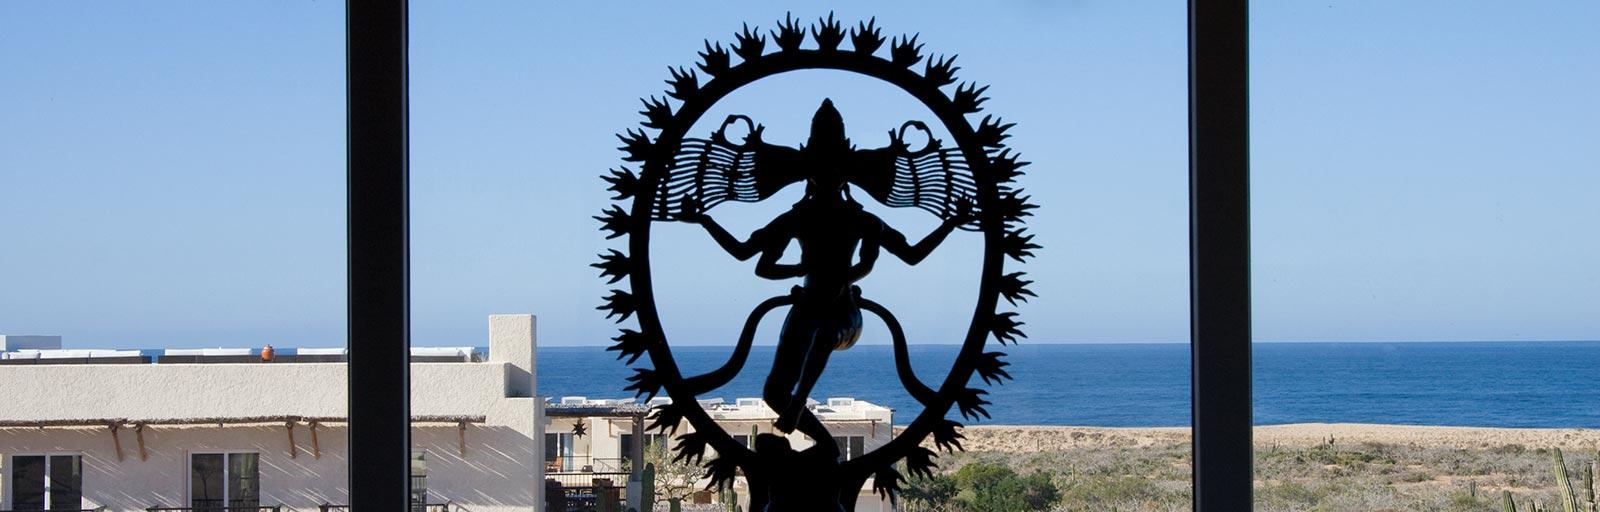 Wellness & Yoga Retreats in Baja, Mexico: Nataraja in the Yoga Studio